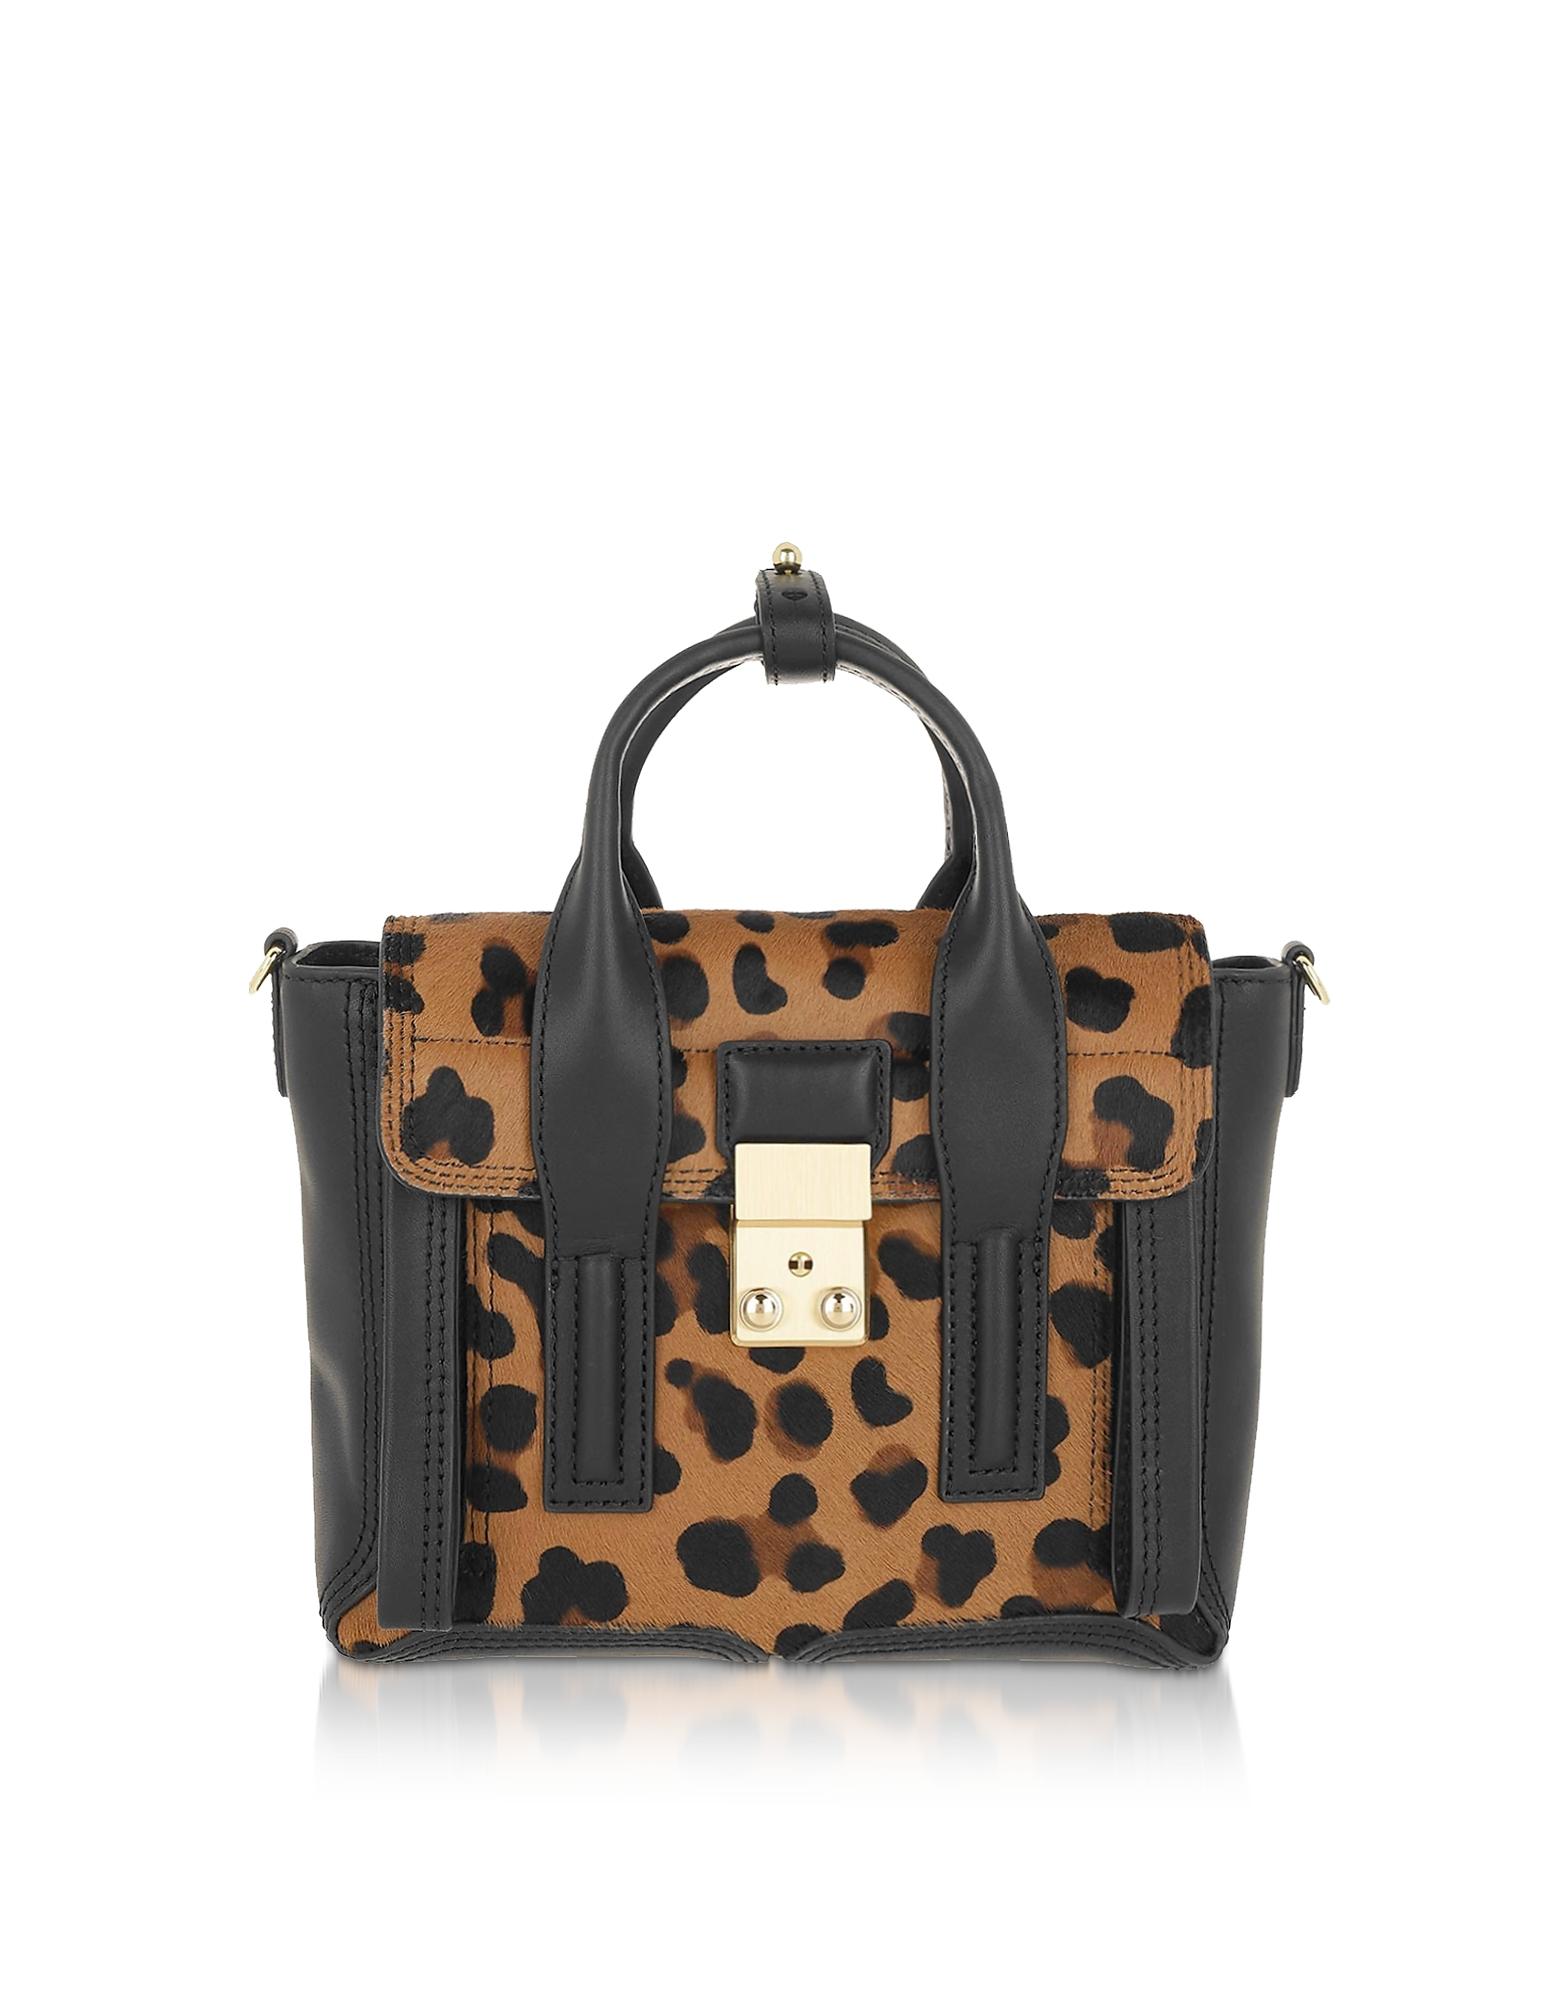 3.1 Phillip Lim  Handbags Leopard Pashli Mini Satchel